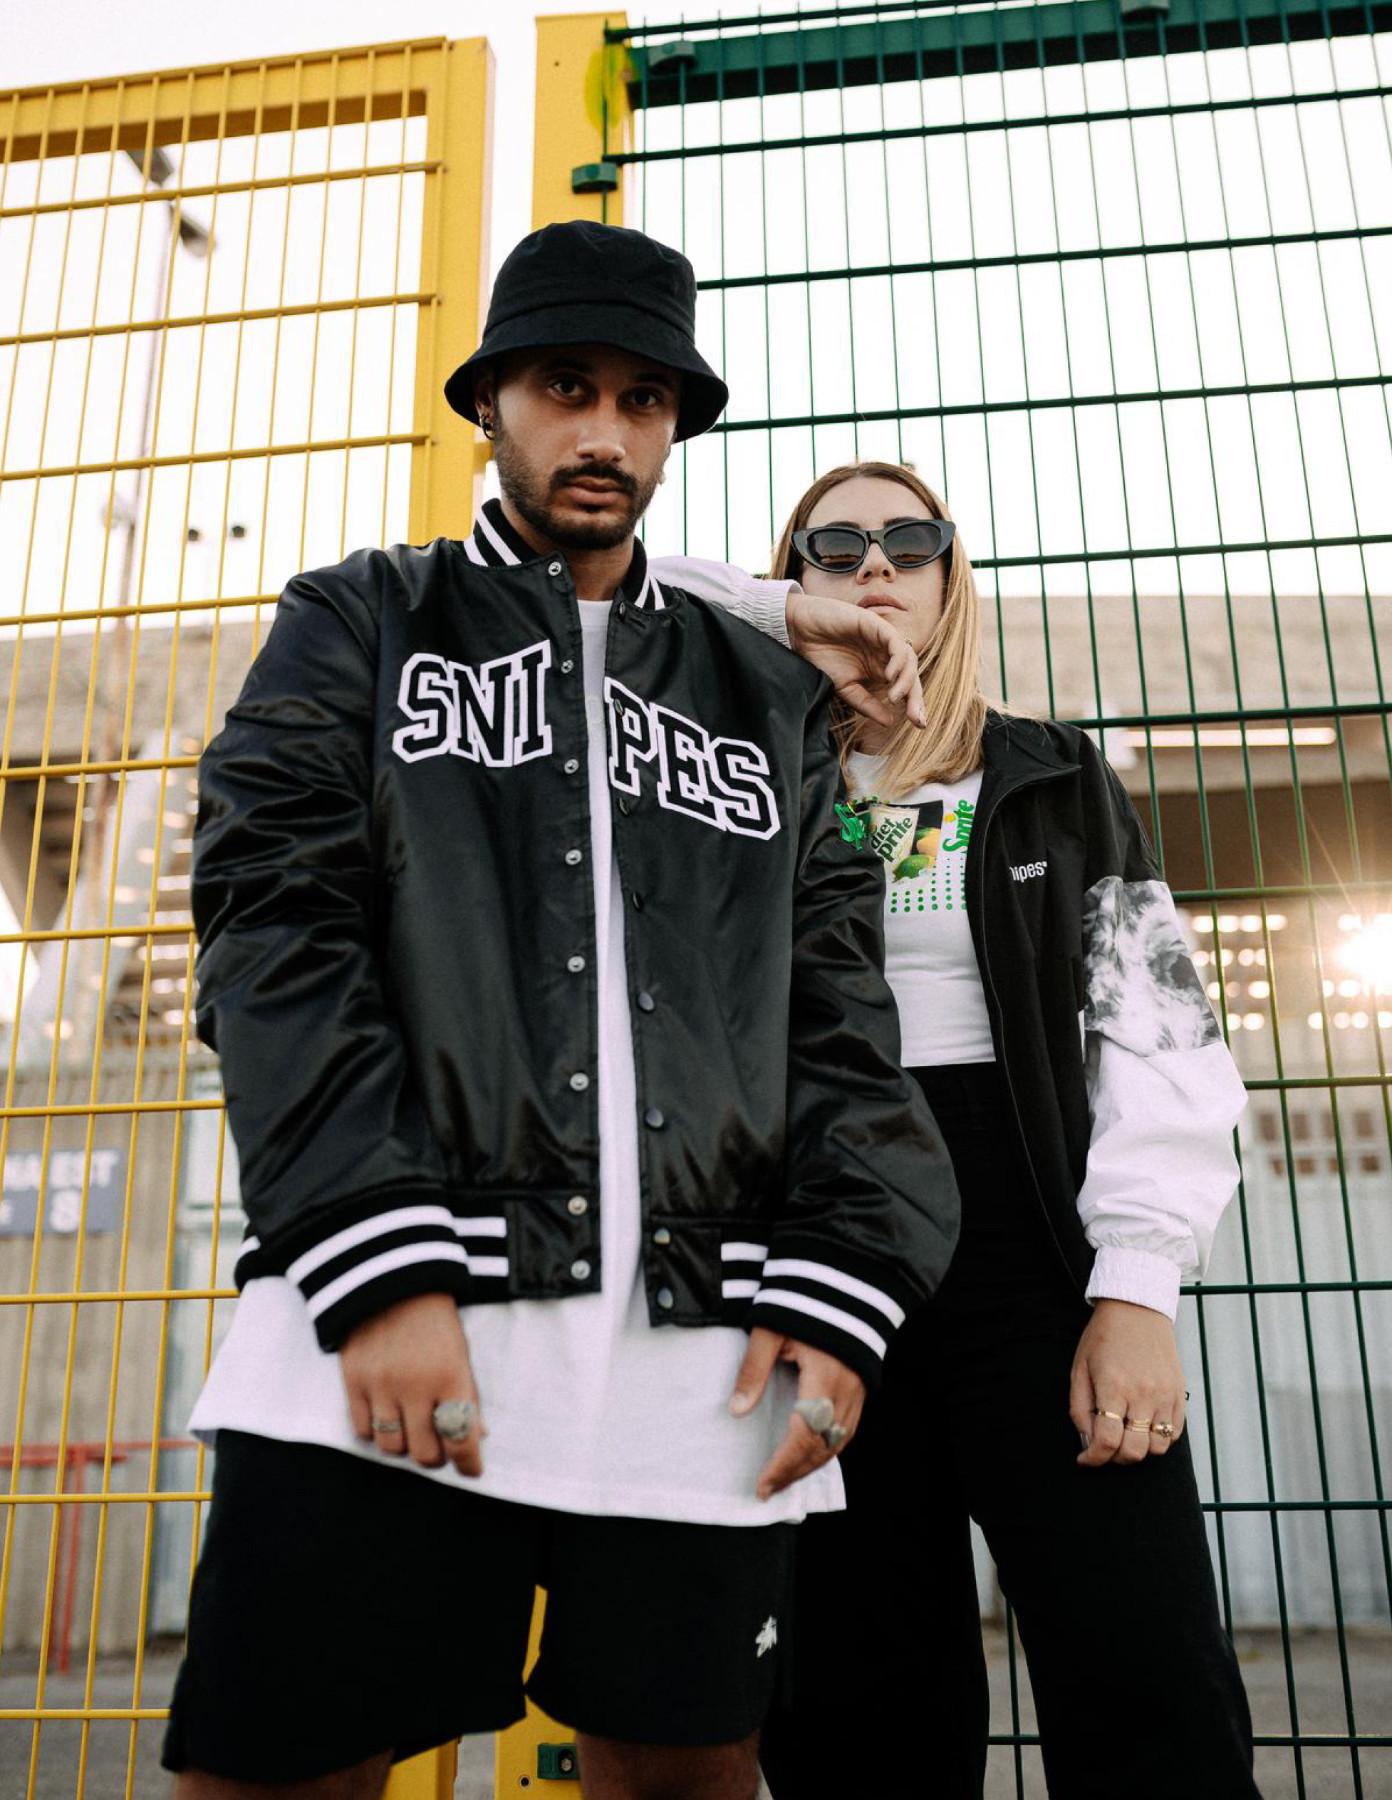 SNIPES x SPRITE jacket